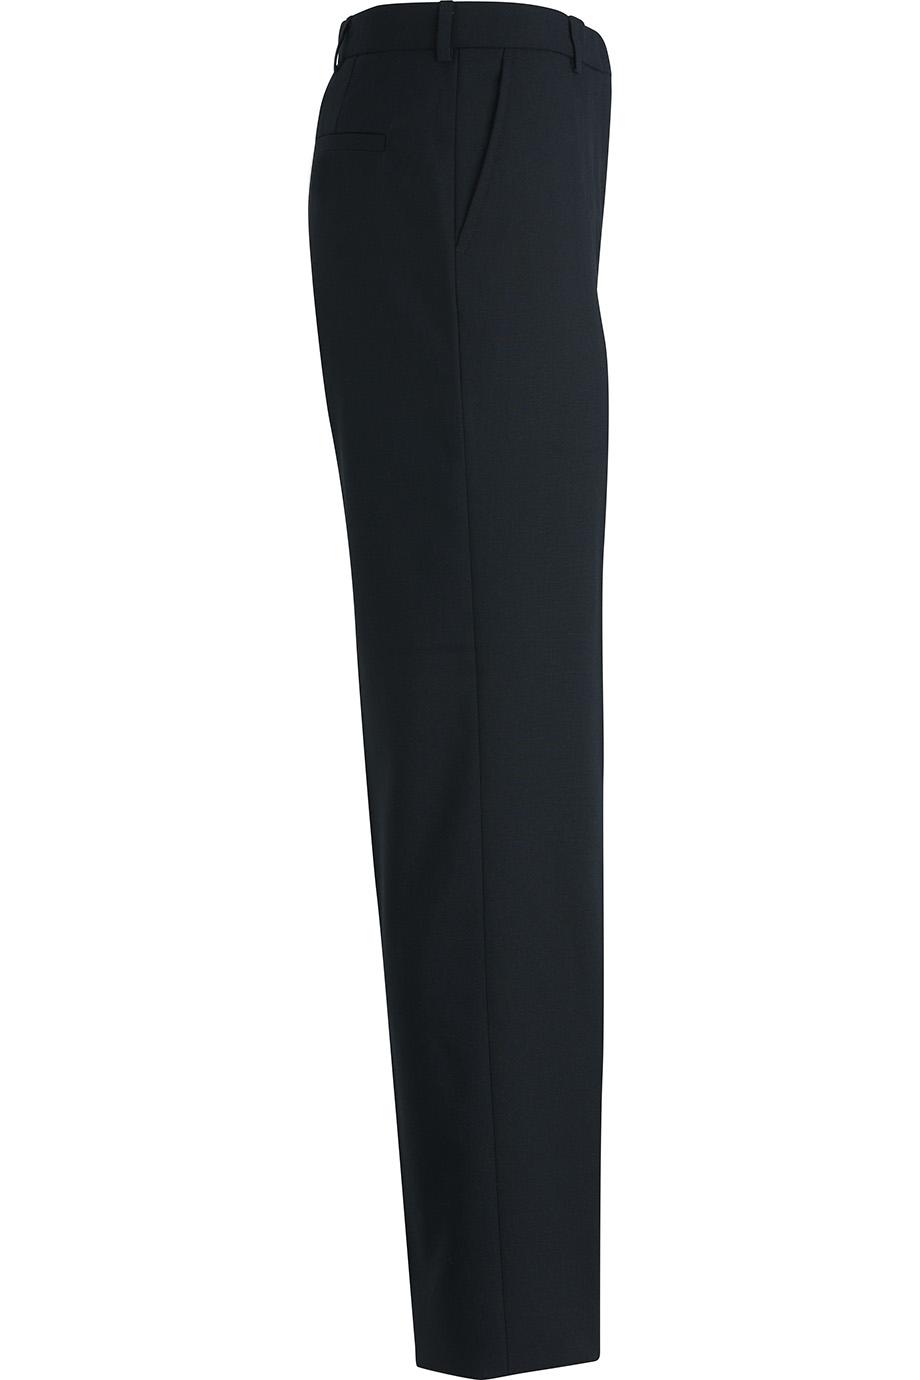 REDWOOD & ROSS® SIGNATURE DRESS PANT